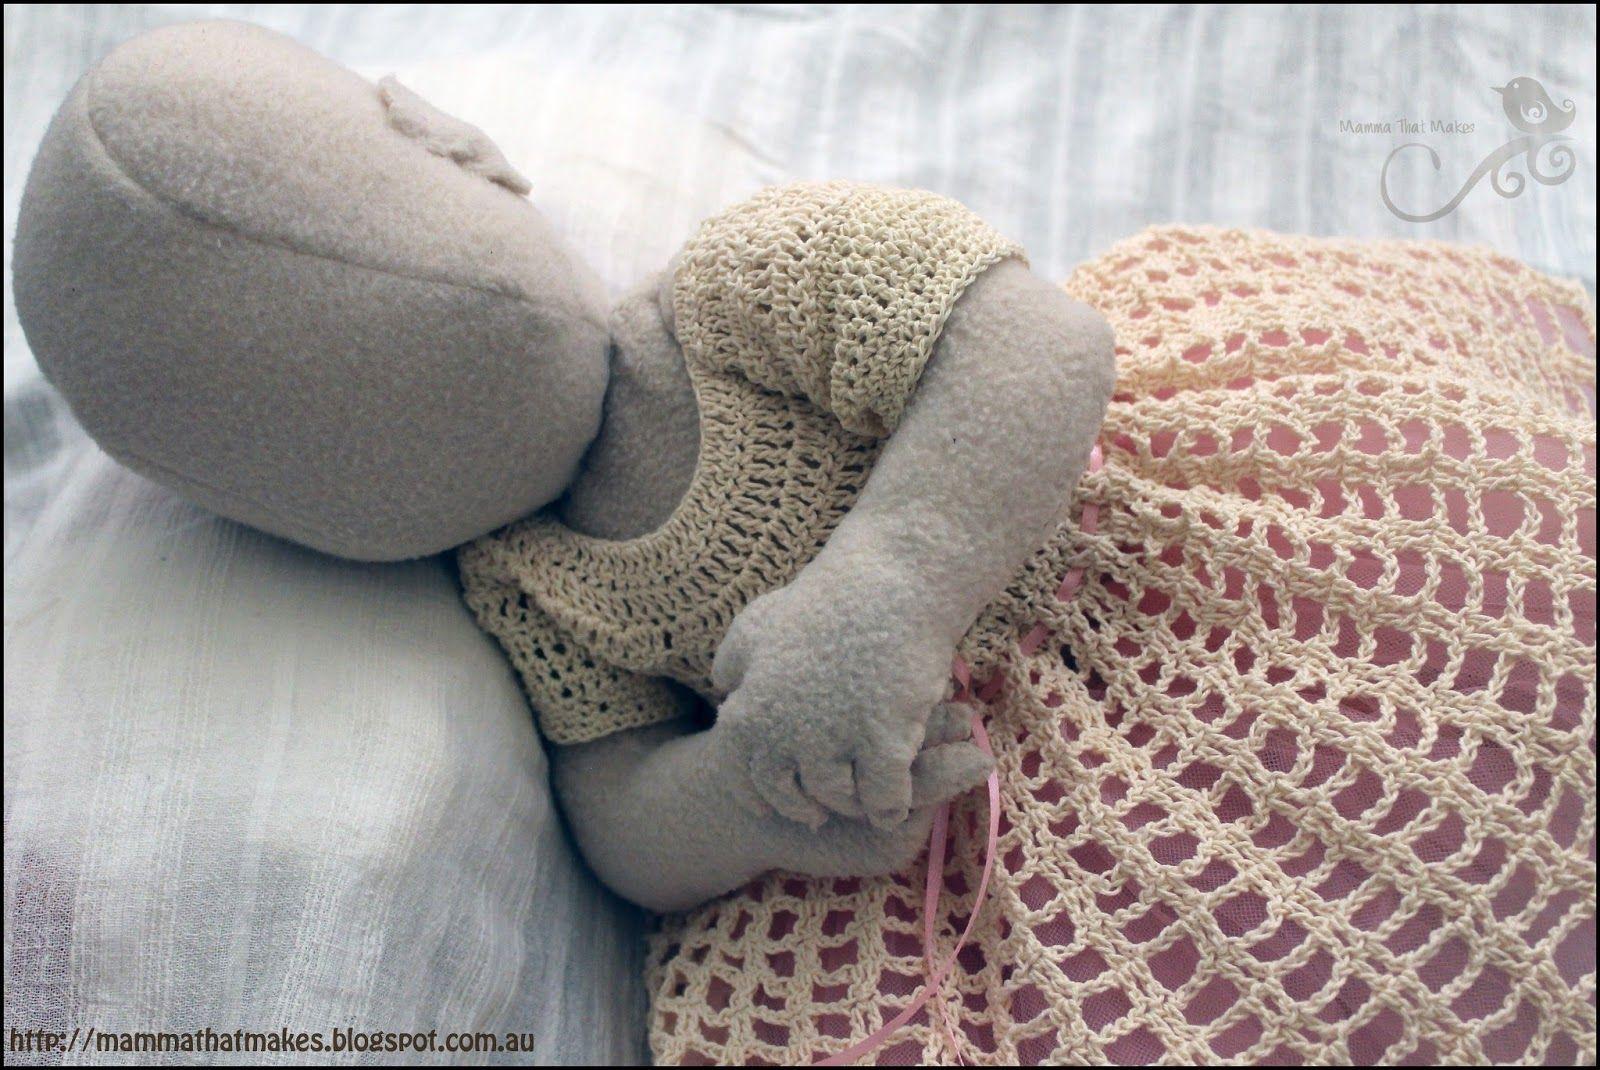 Delicate Princess Newborn Dress | Thread crochet, Delicate and Princess